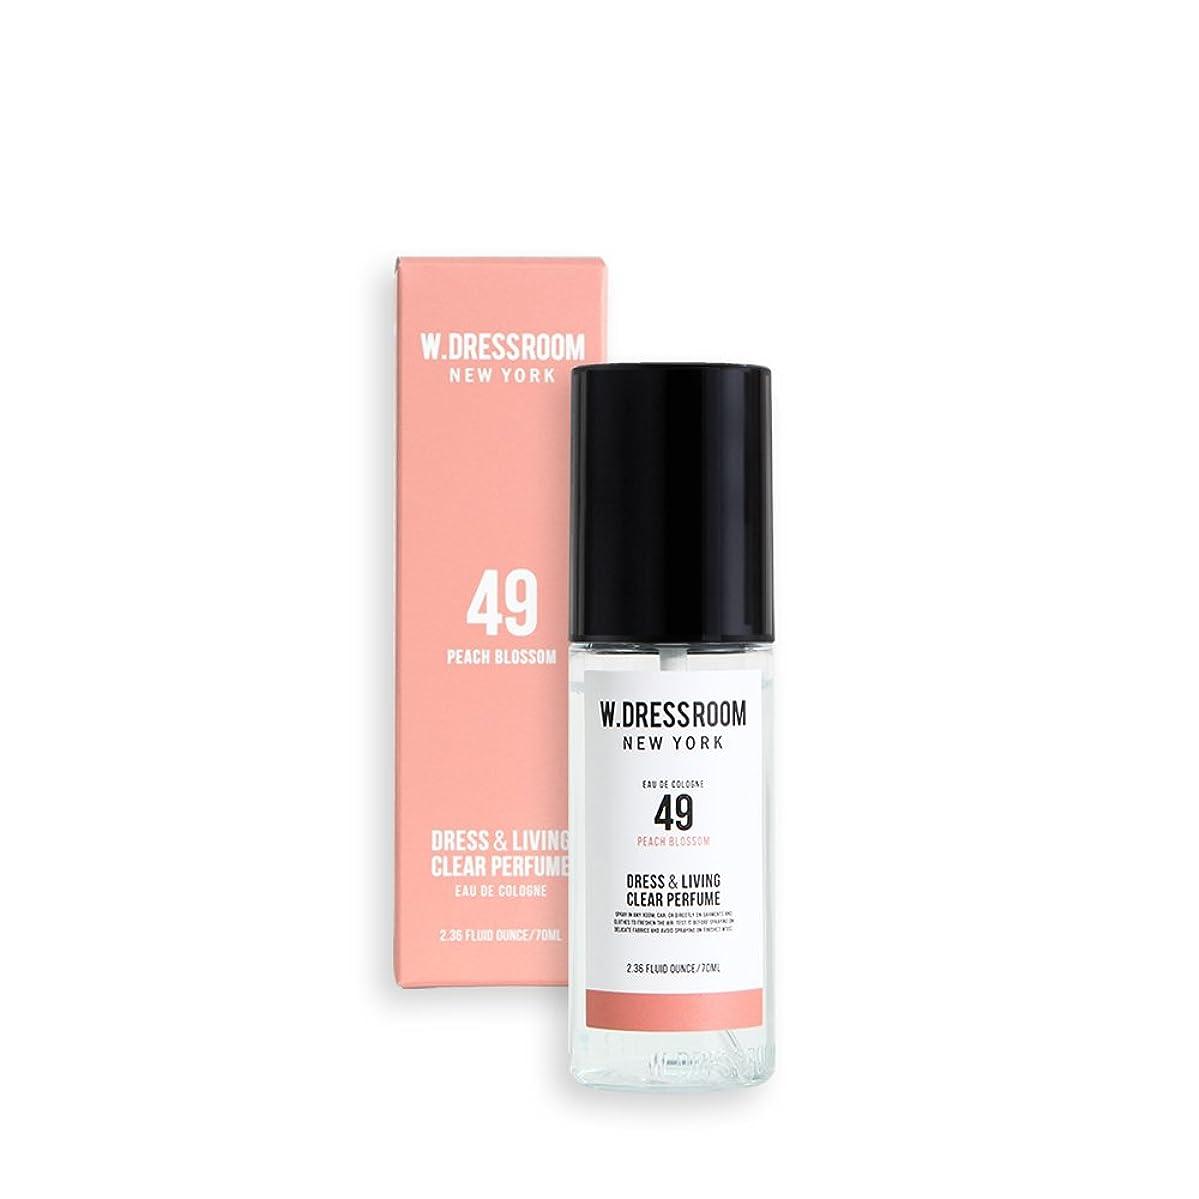 W.DRESSROOM Dress & Living Clear Perfume 70ml (#No.49 Peach Blossom)/ダブルドレスルーム ドレス&リビング クリア パフューム 70ml (#No.49 Peach Blossom) [並行輸入品]